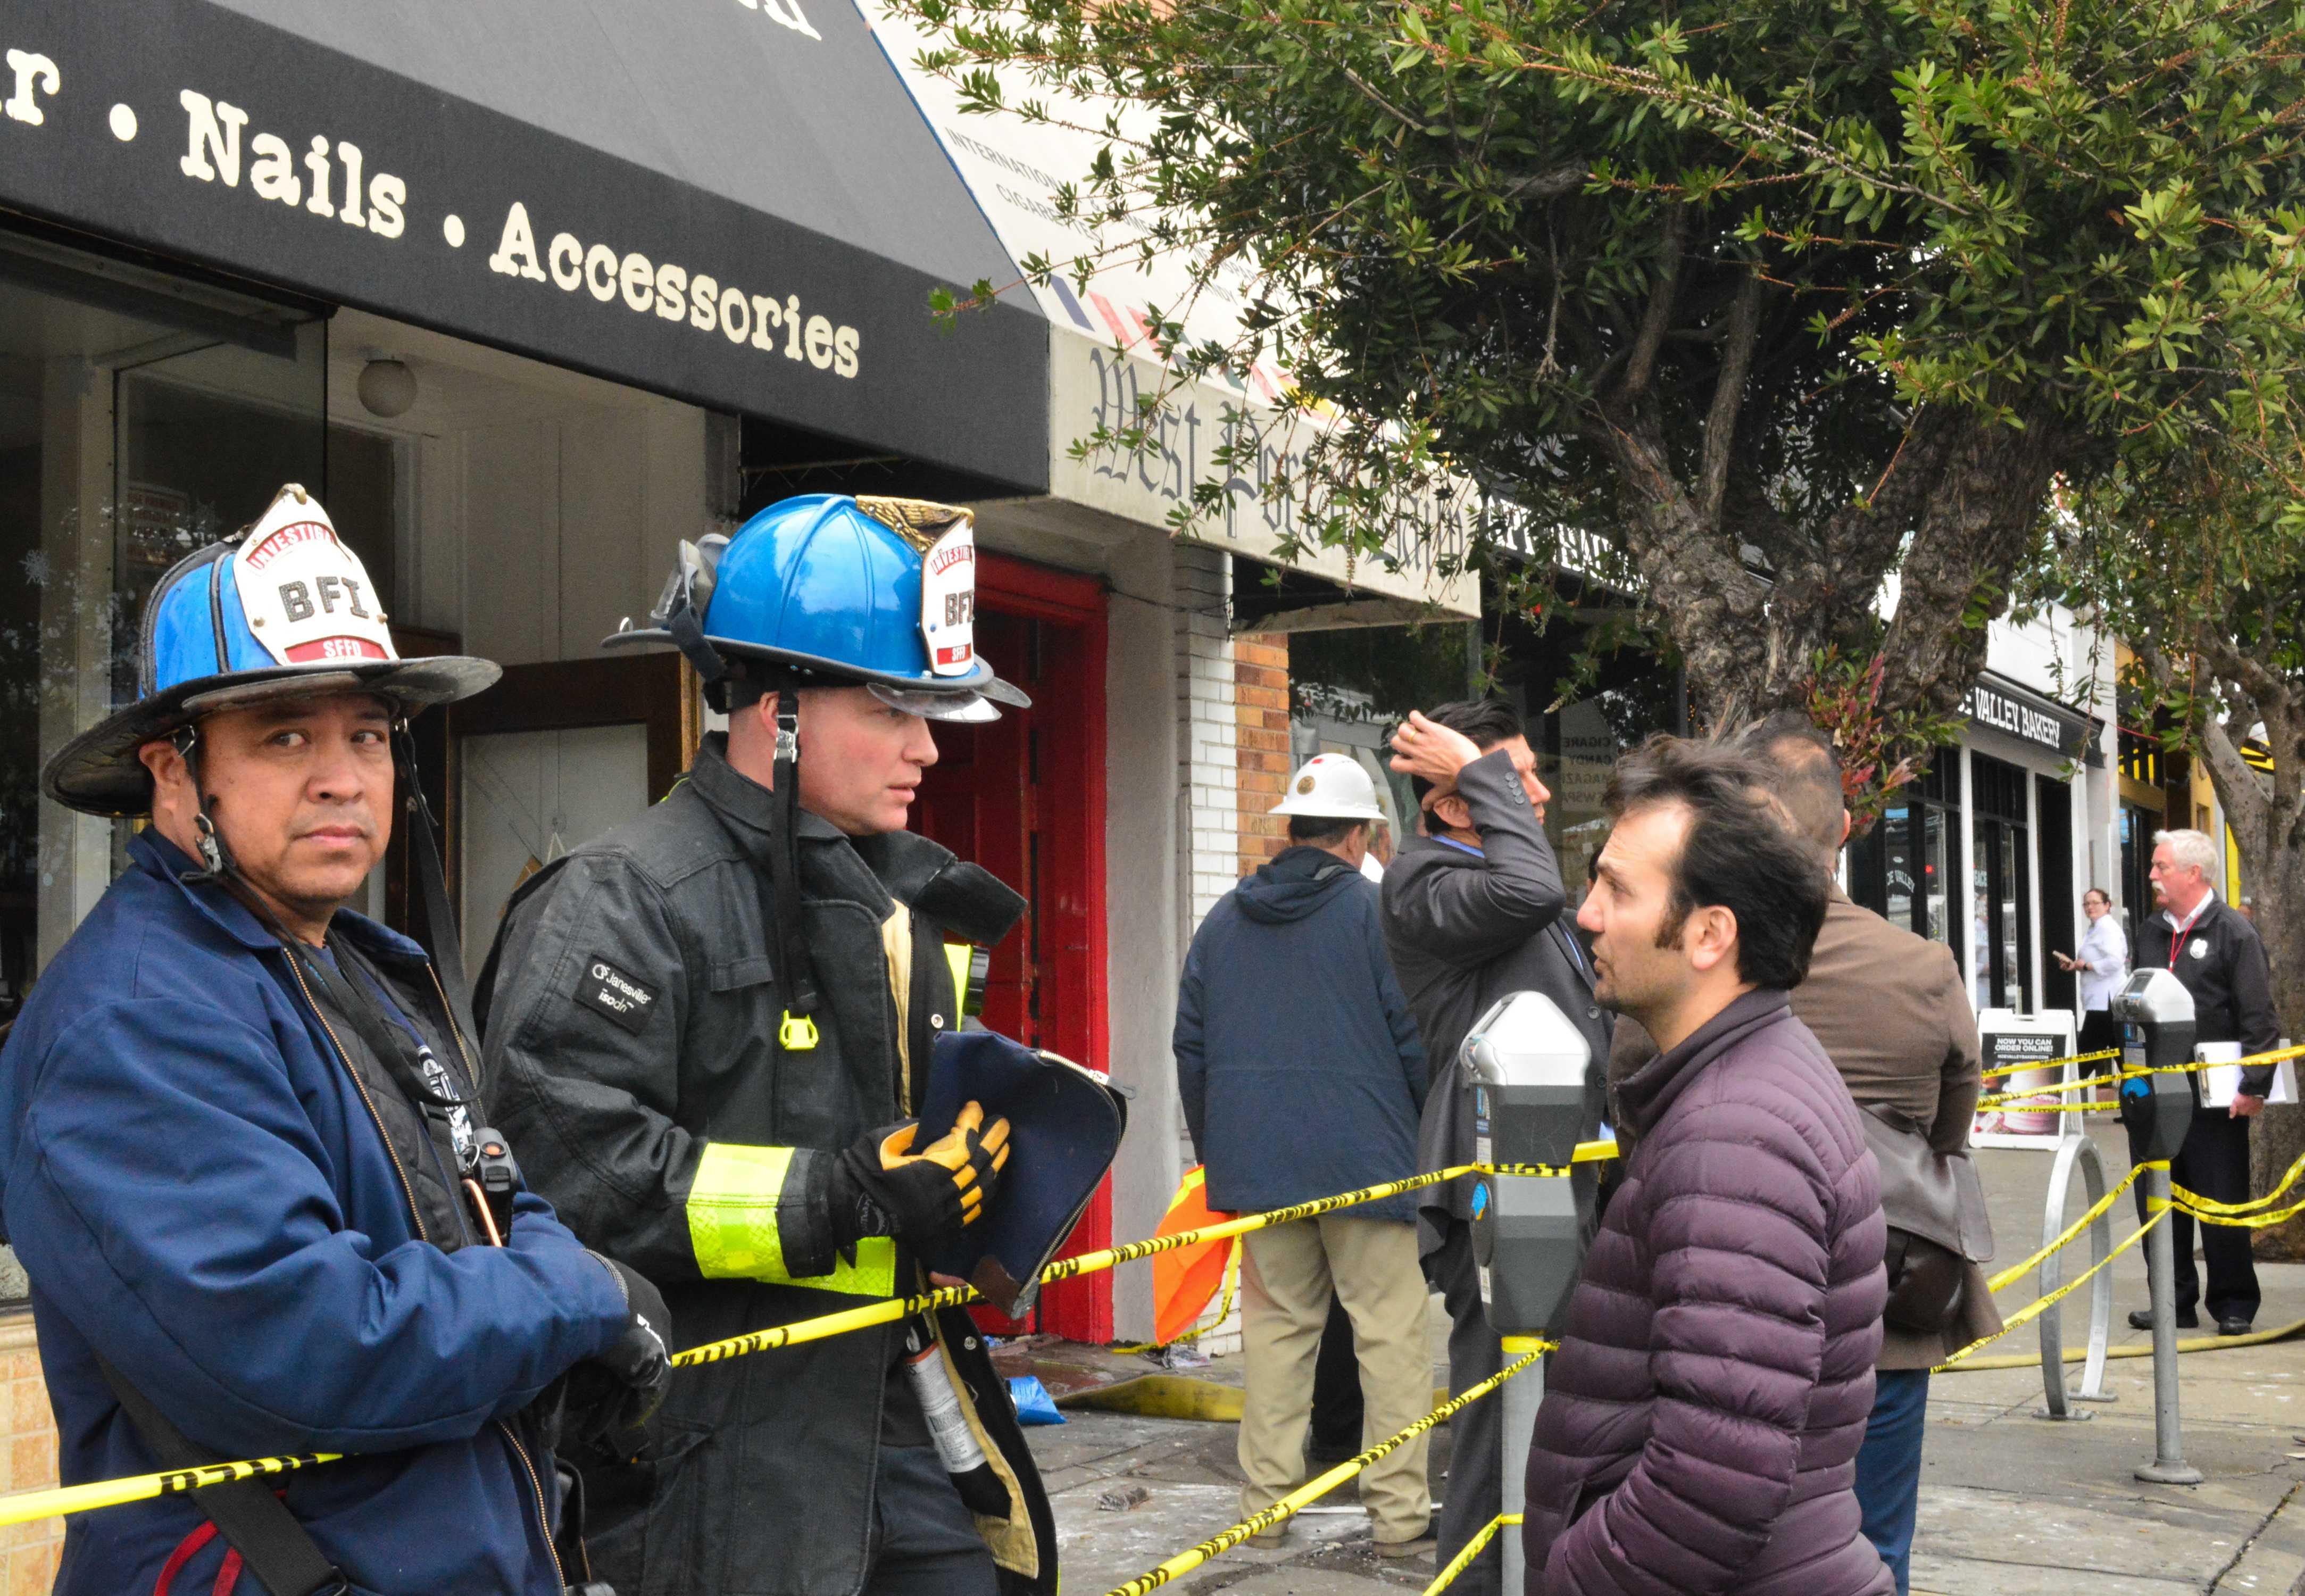 West Portal fire under investigation